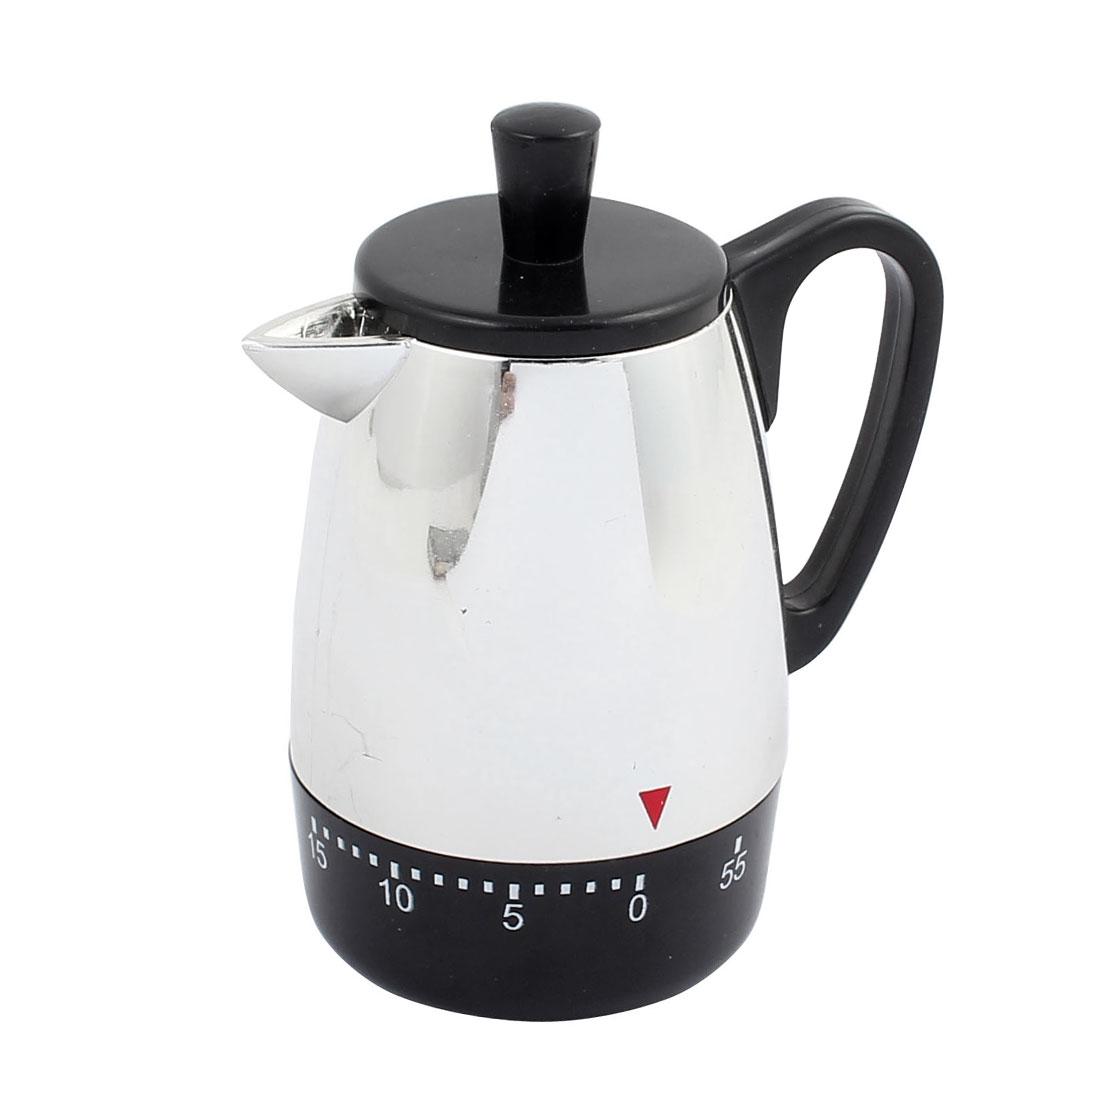 4x3.4x2.2-Inch 60 Mins Mechanical Kitchen Timer Coffee Pot Design